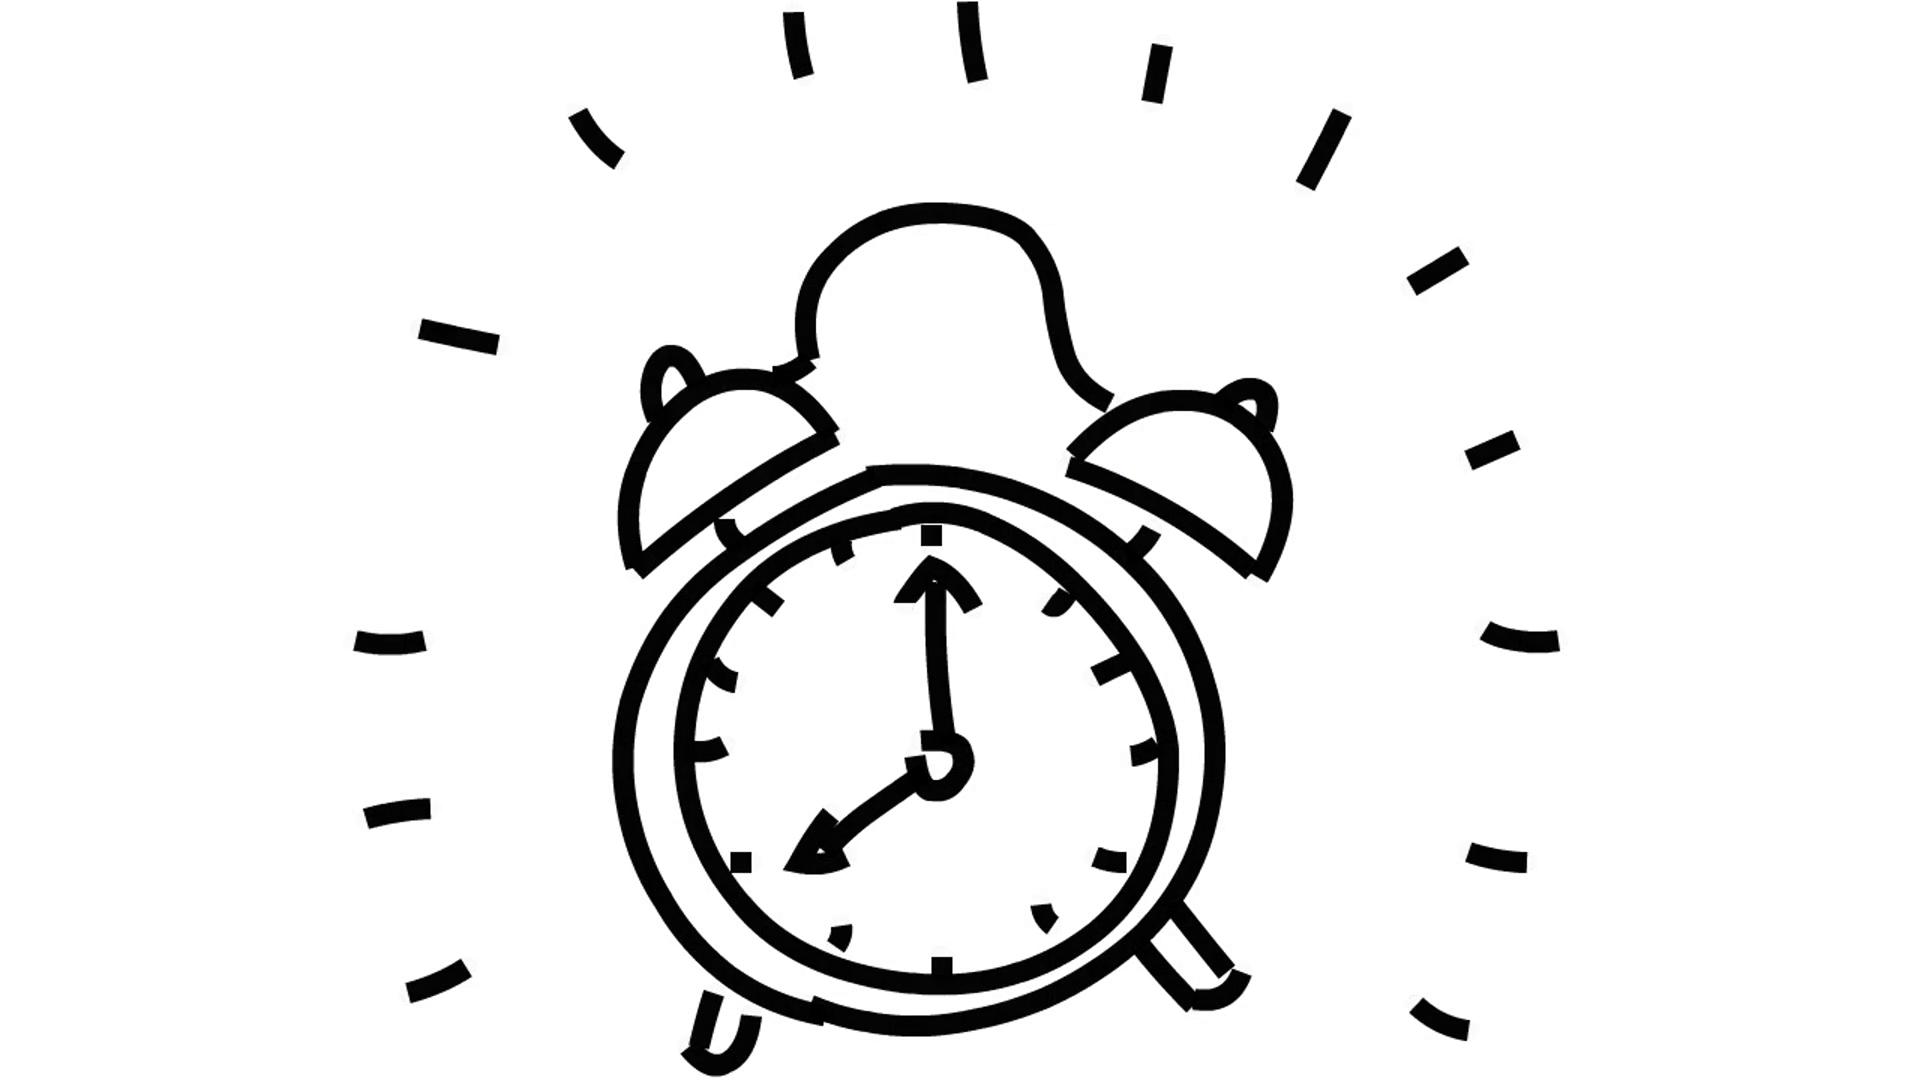 1920x1080 Man Sketching Vintage Alarm Clock On Whiteboard Background